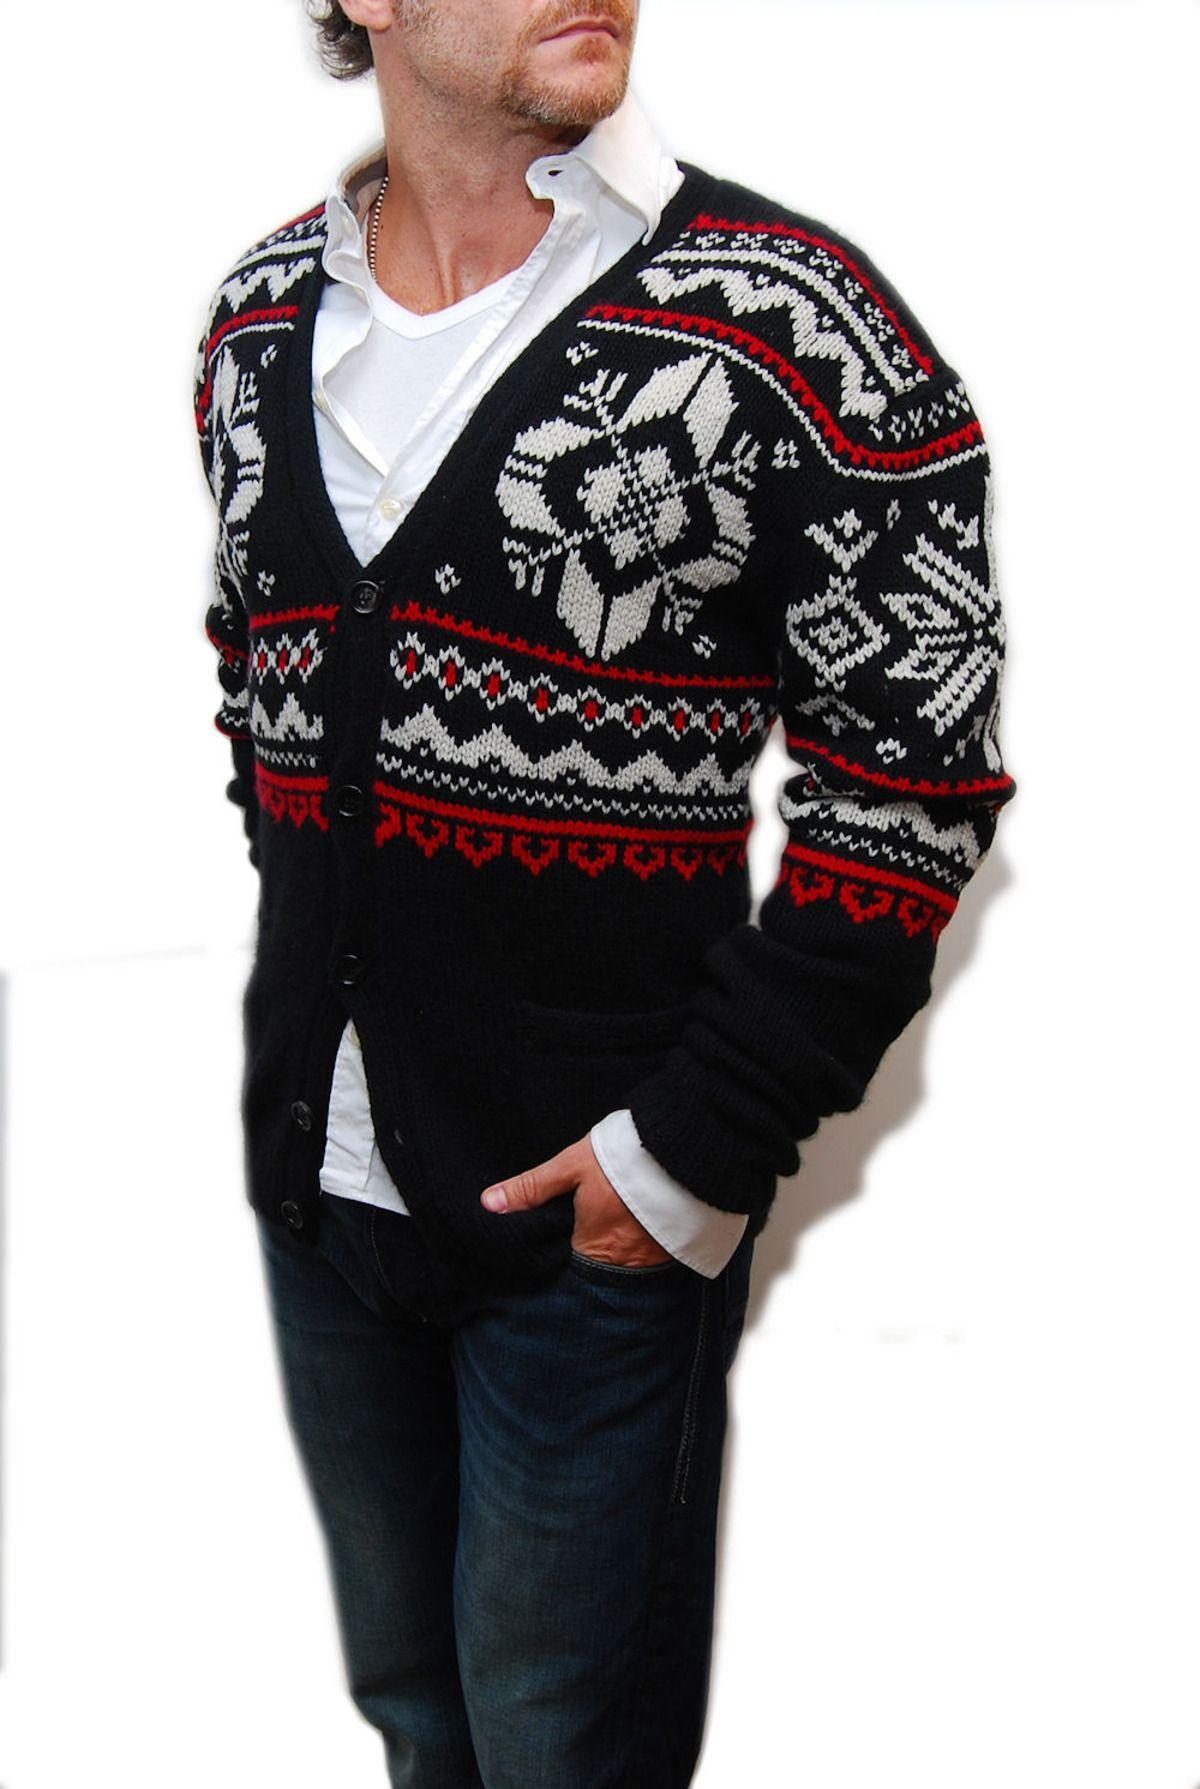 4525d60b8b6 Polo Ralph Lauren Purple Label Mens Sweater Black Cashmere Cardigan Small   1695